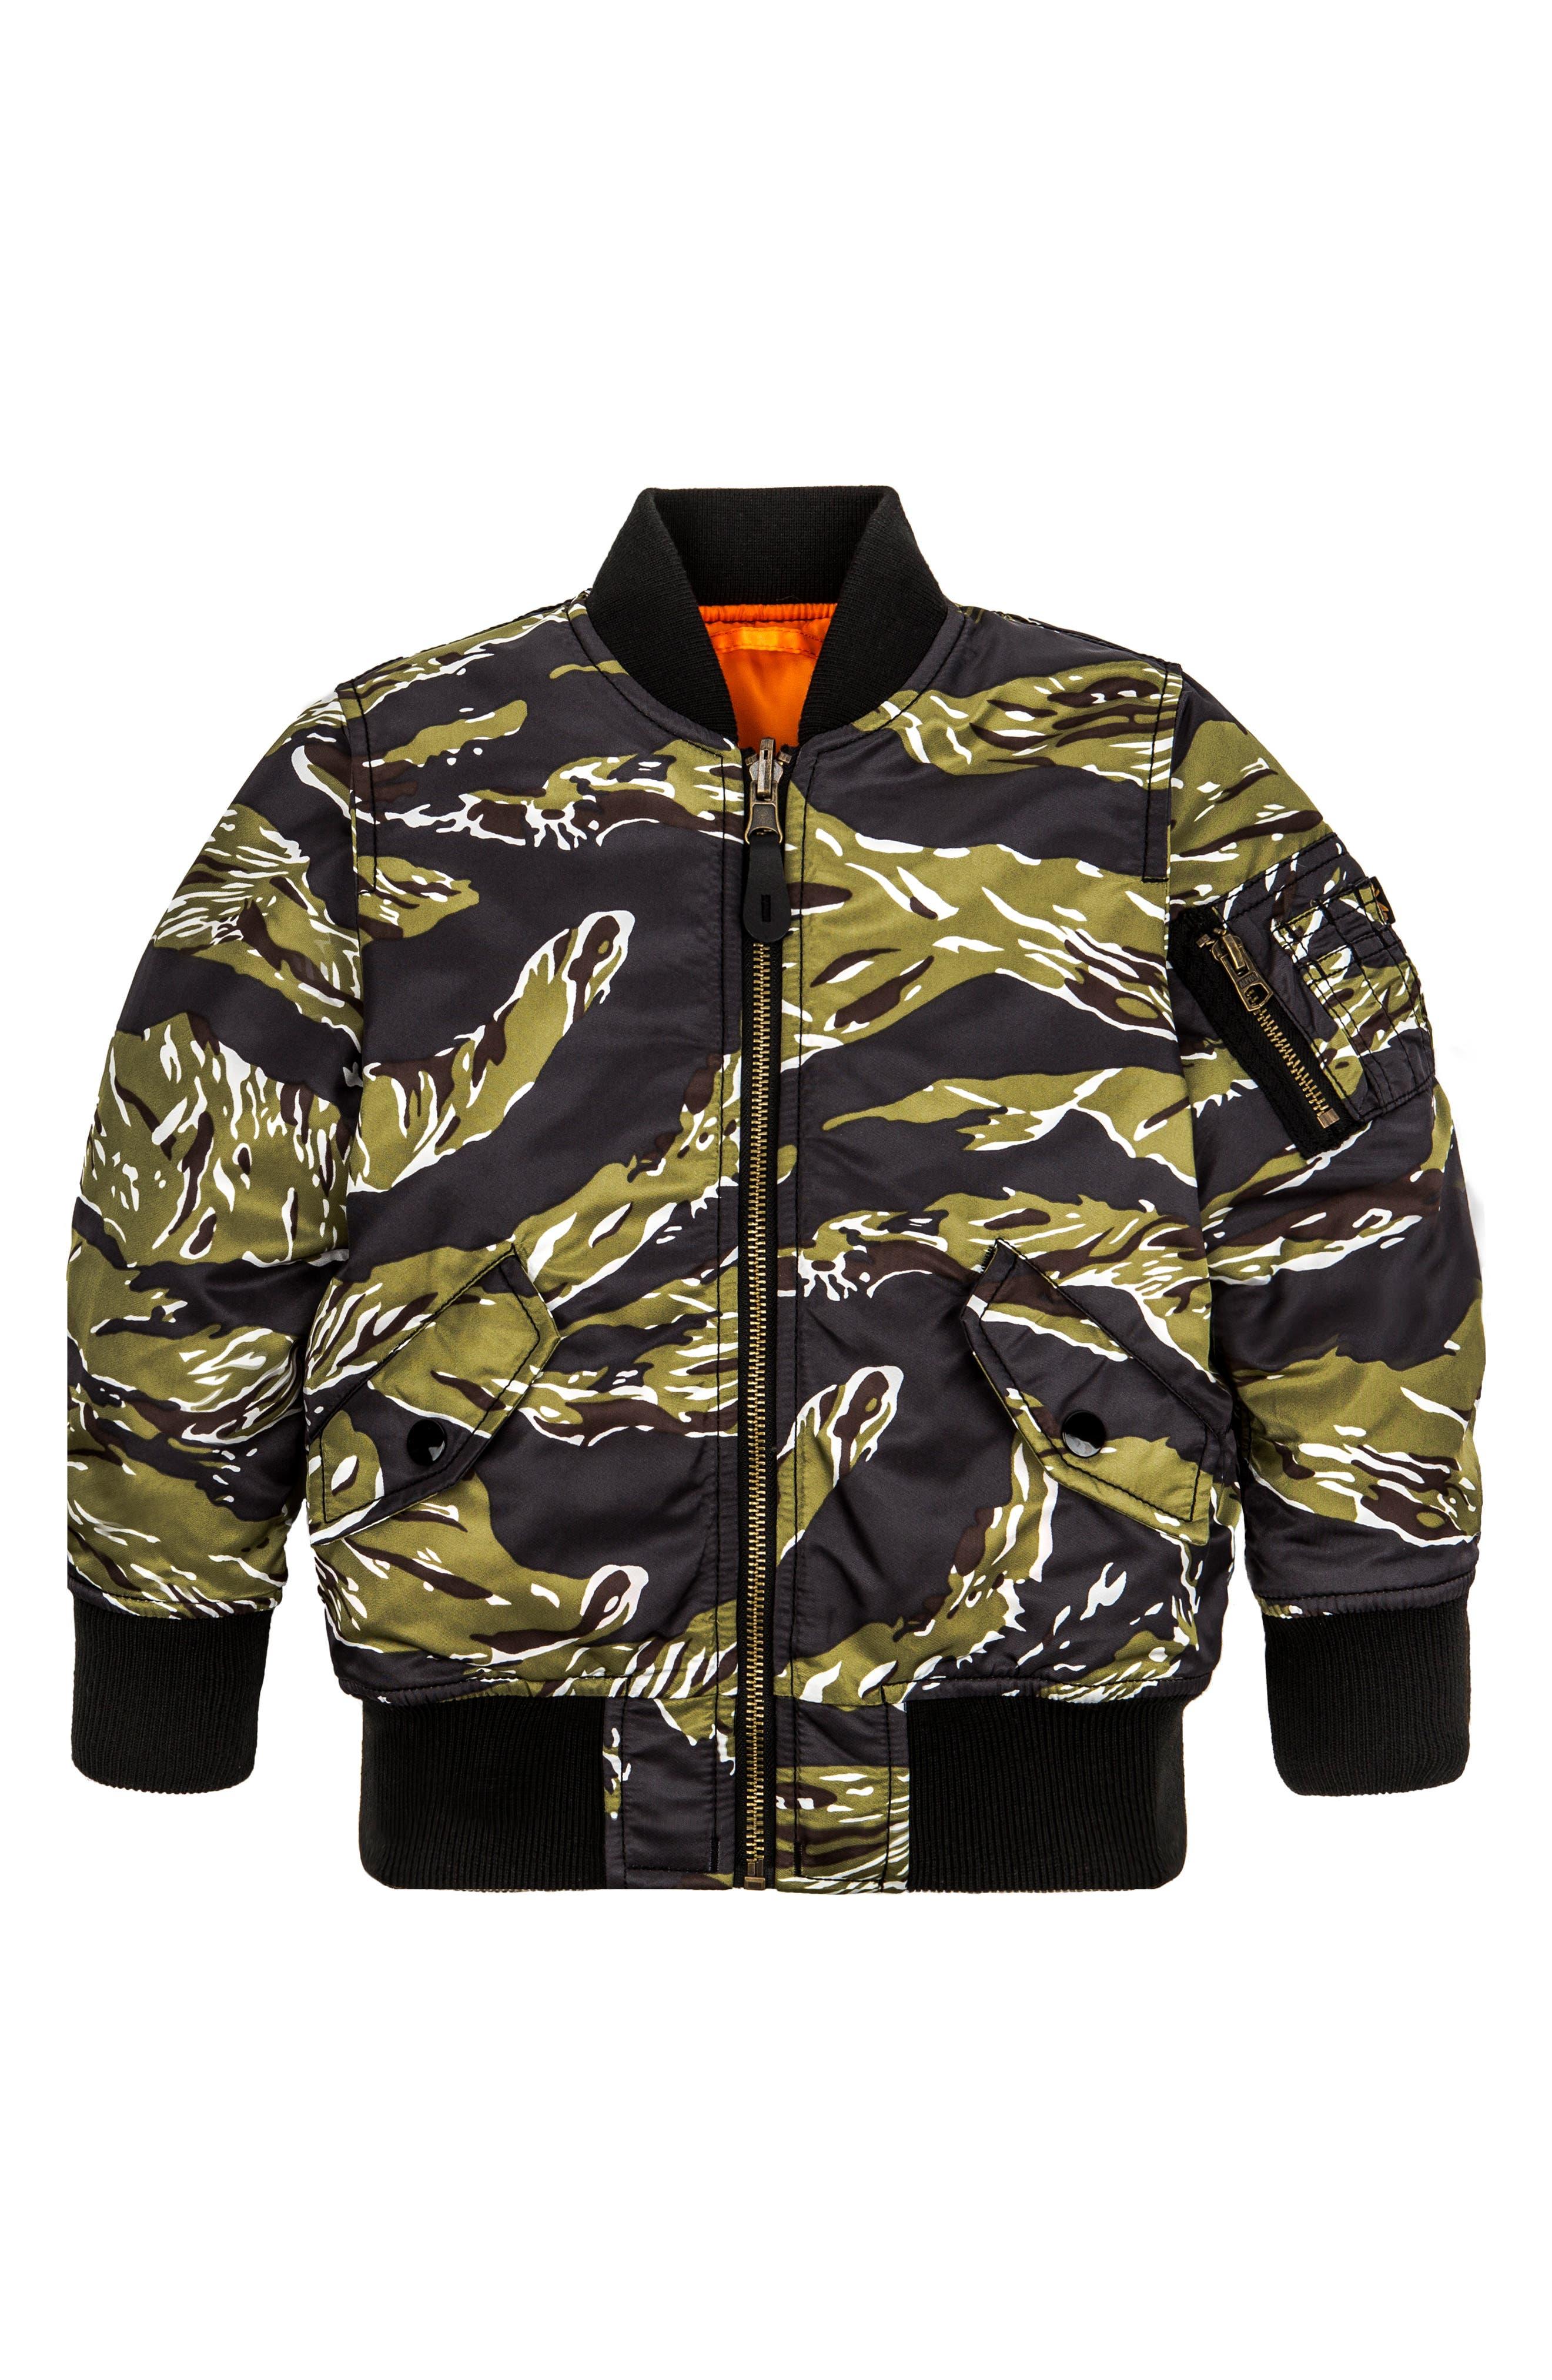 ALPHA INDUSTRIES MA-1 Flight Jacket, Main, color, TIGER CAMO